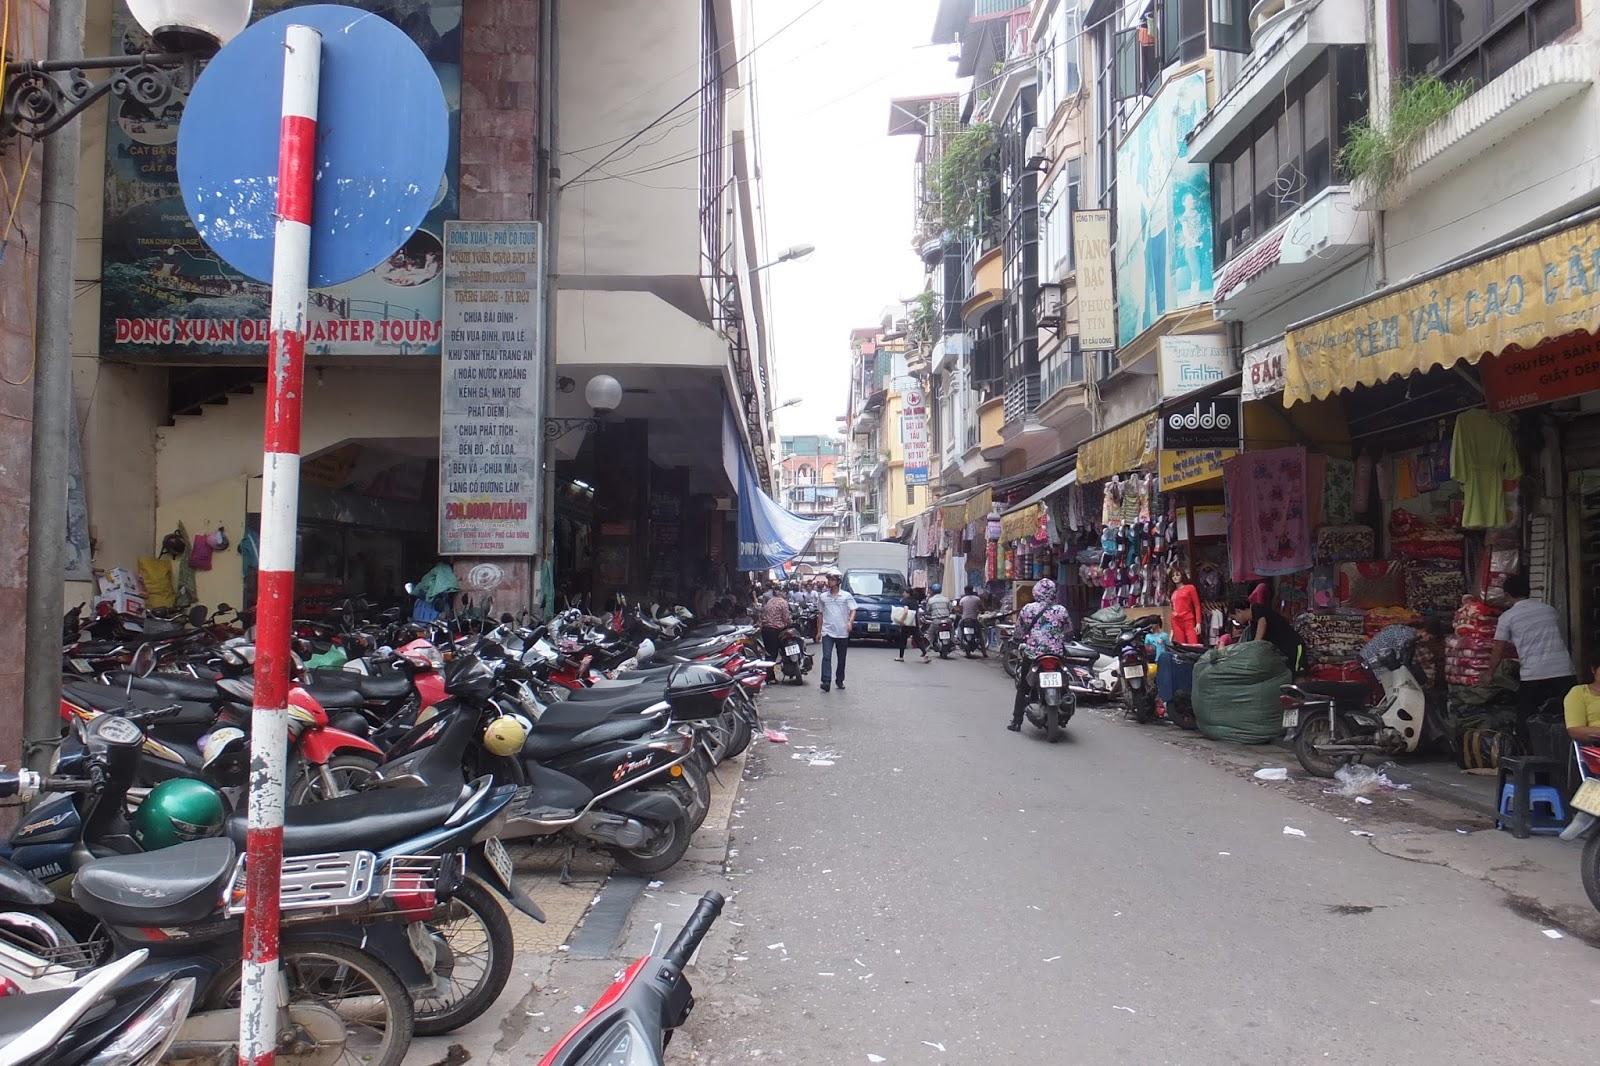 dong-xuan-market-sidestreet ドンスンアン市場の側面